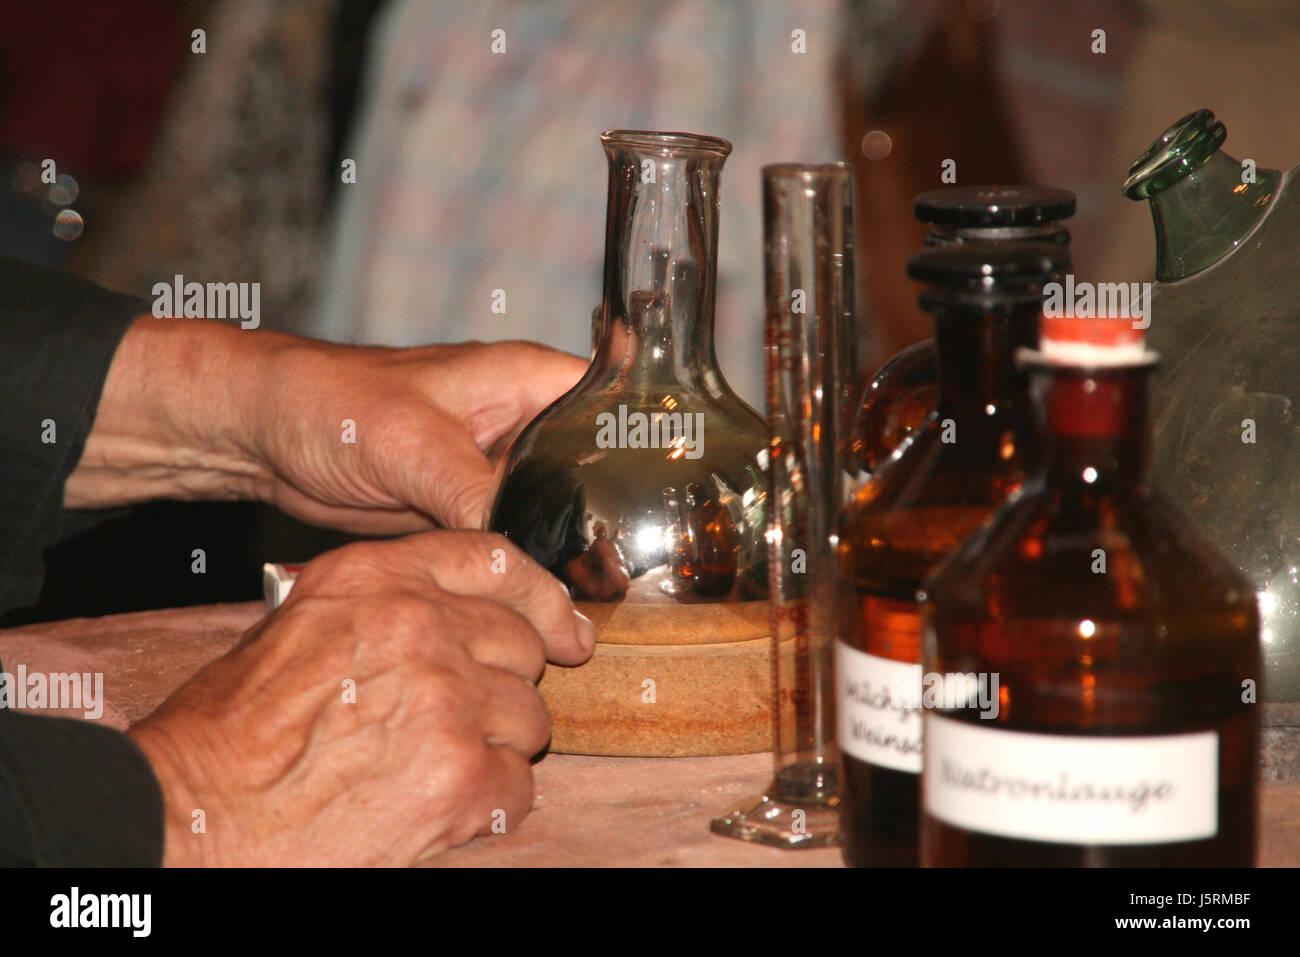 alchemy 1 - Stock Image